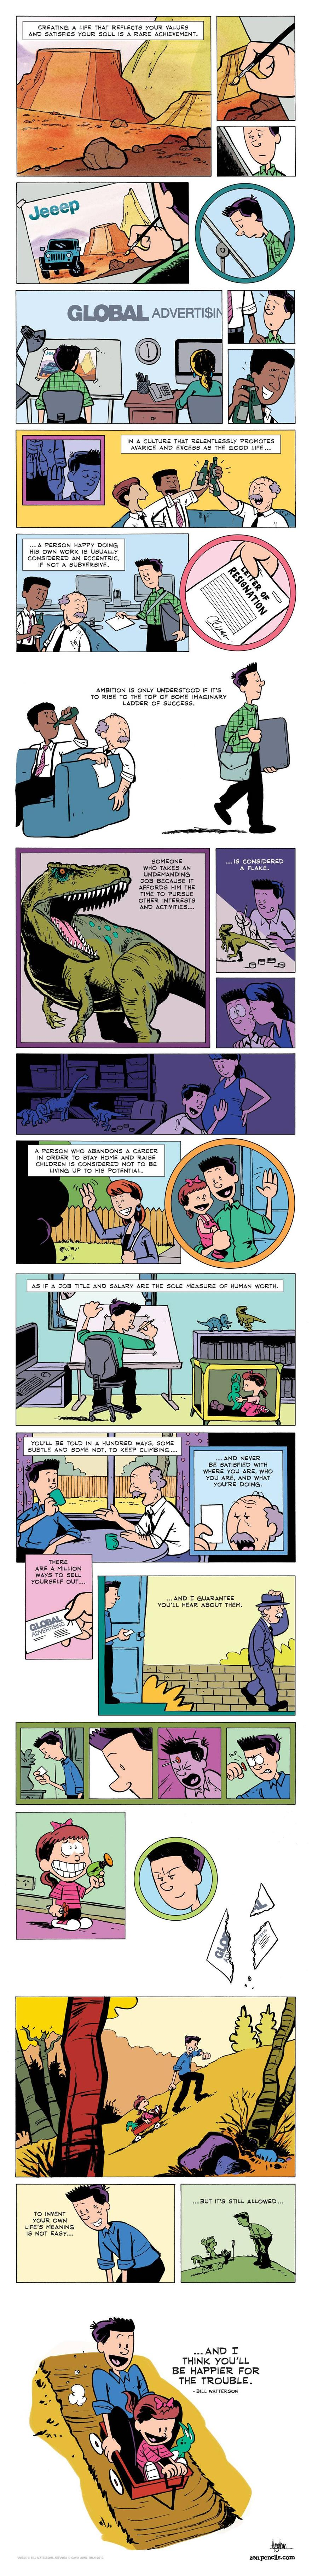 An incredible comic by Bill Watterson - Imgur